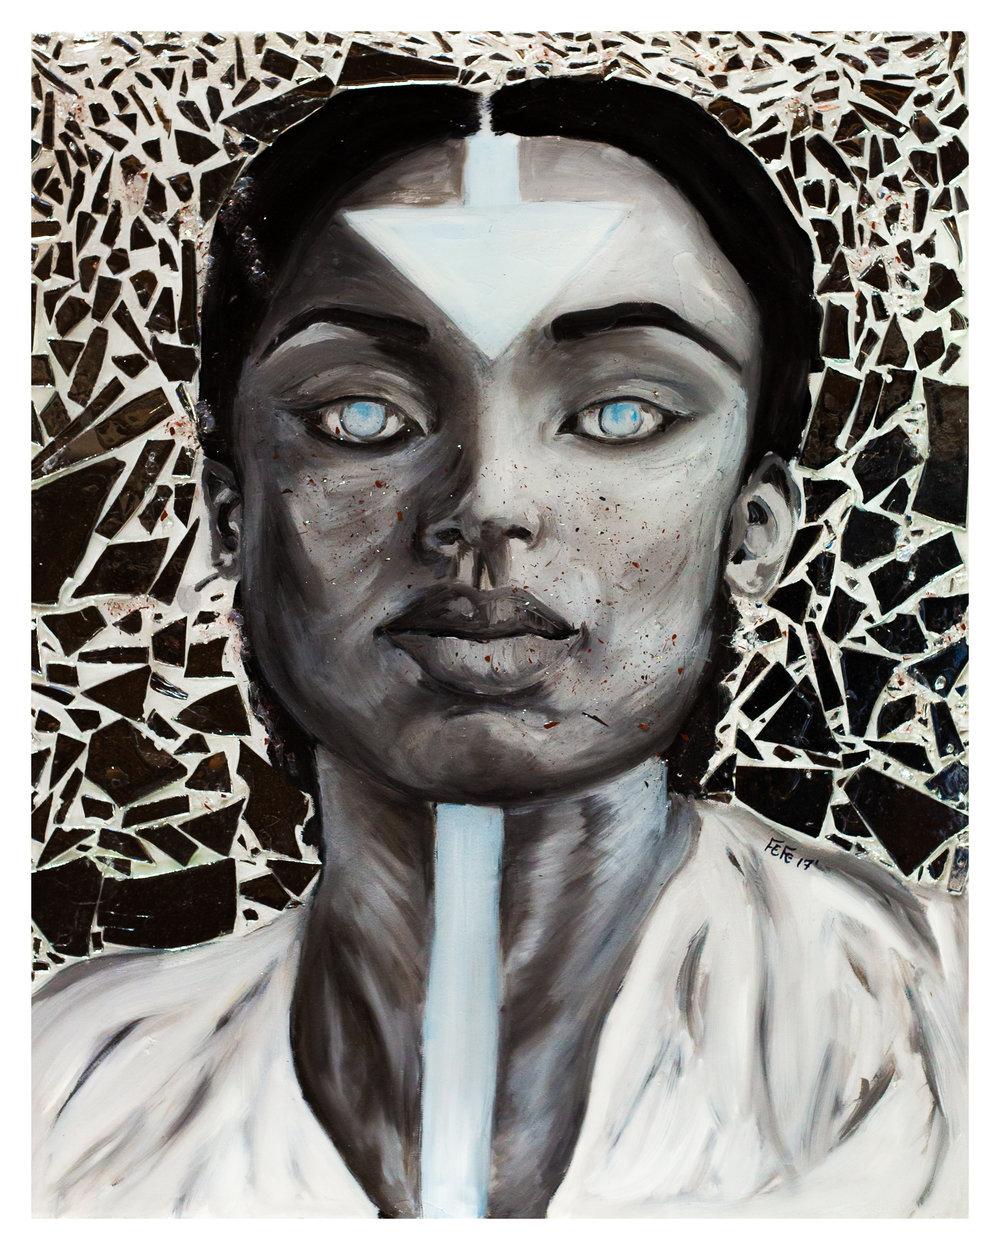 6. Fefe - Beautiful Sadness - 24 x 30 - OilMirrorResin on Canvas - 2017 - $1,200.jpg